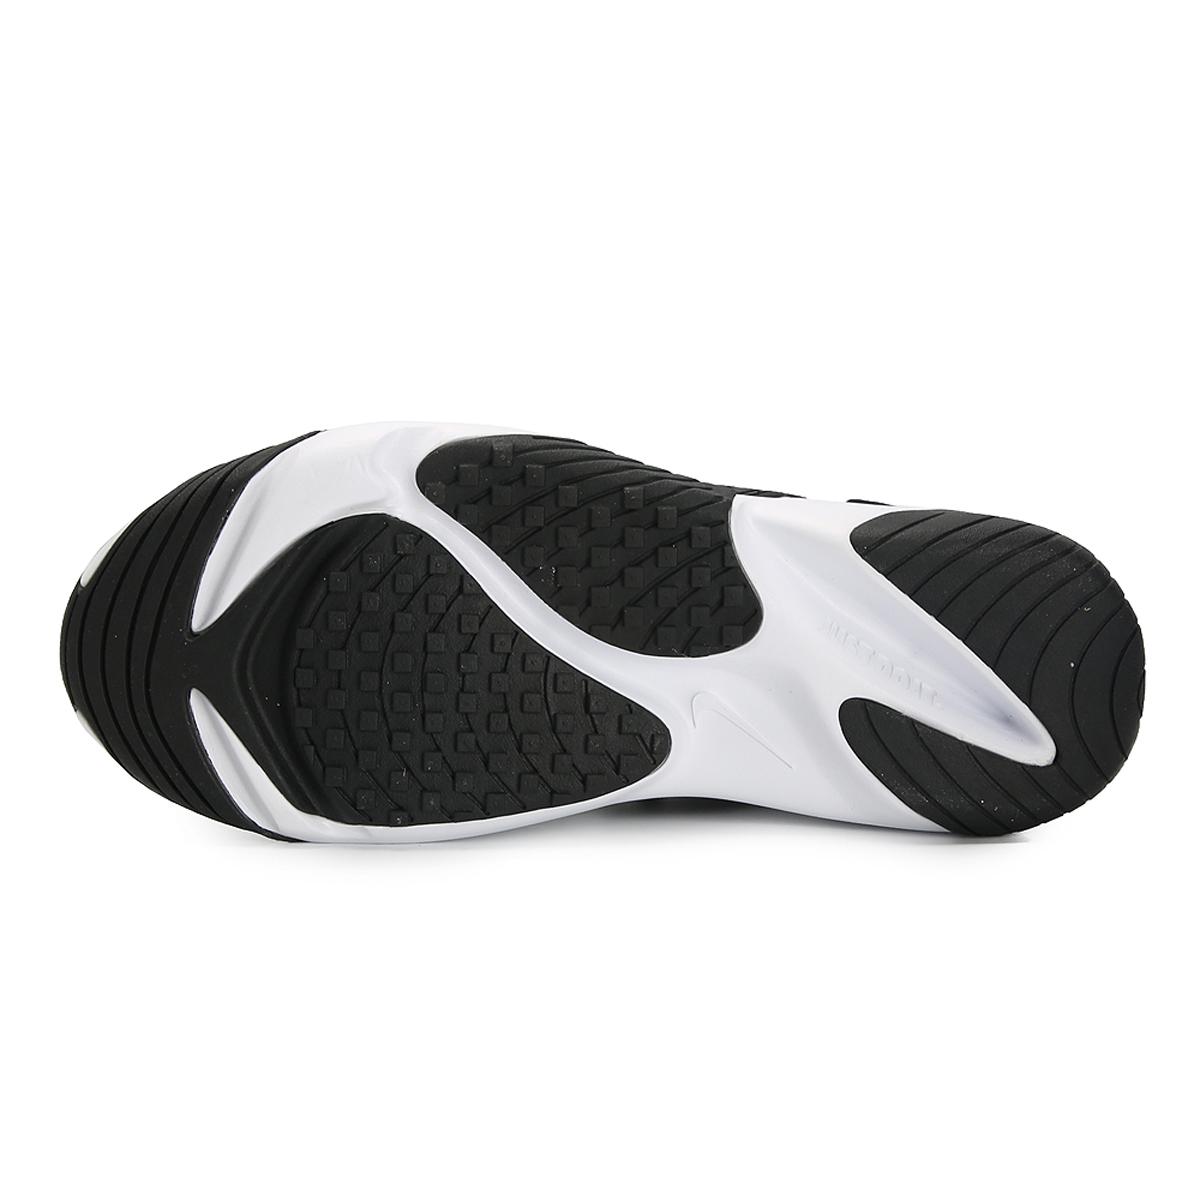 Nike耐克2019年新款女子WMNS NIKE ZOOM 2K复刻鞋AO0354-100